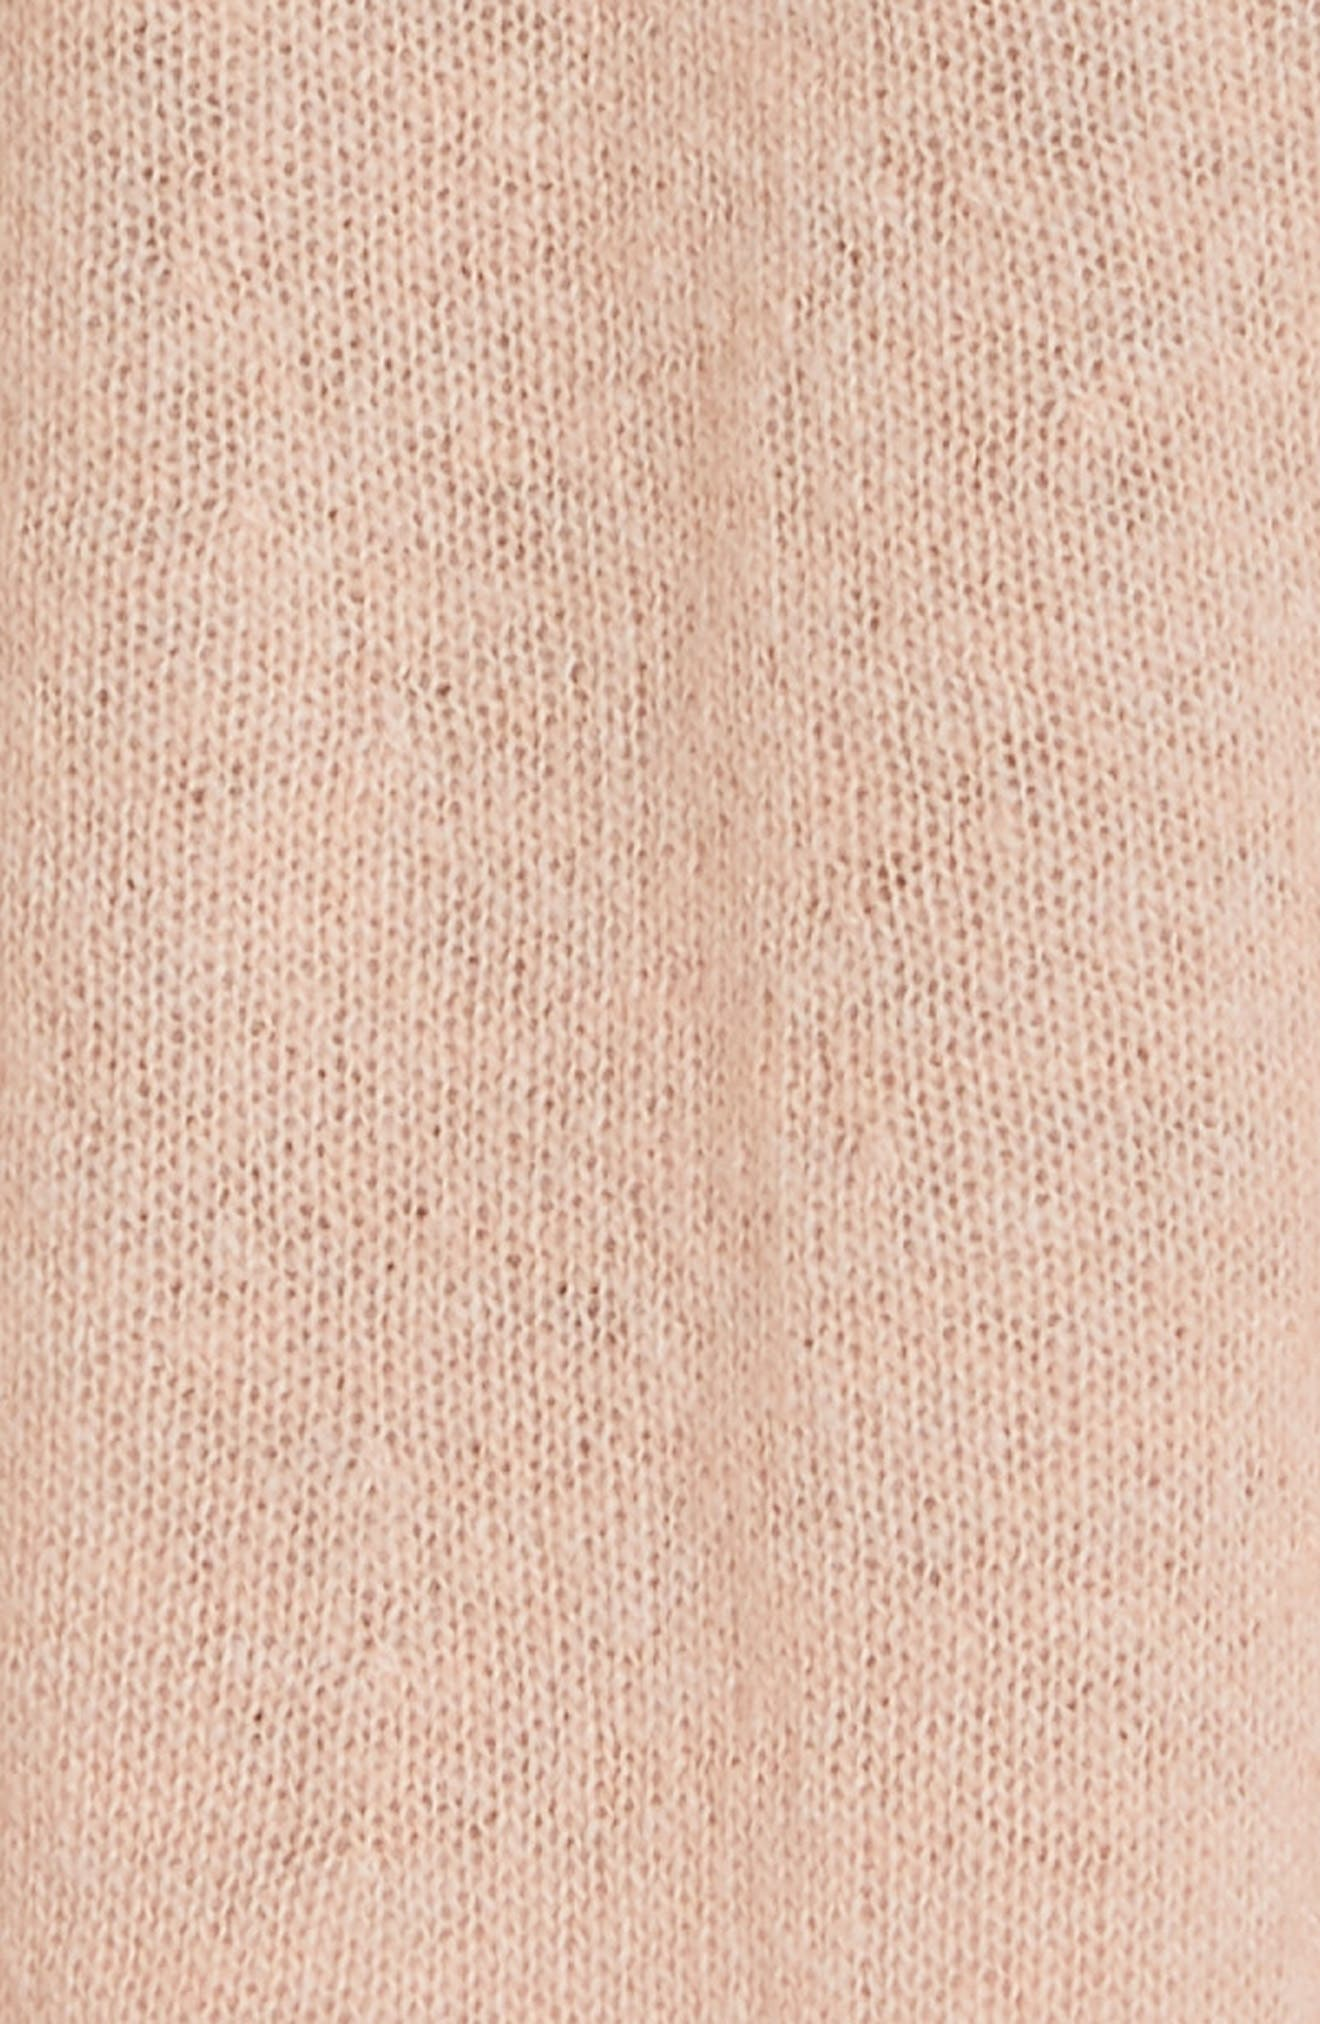 Clover Tie Back Cashmere Blend Sweater,                             Alternate thumbnail 5, color,                             ROSE